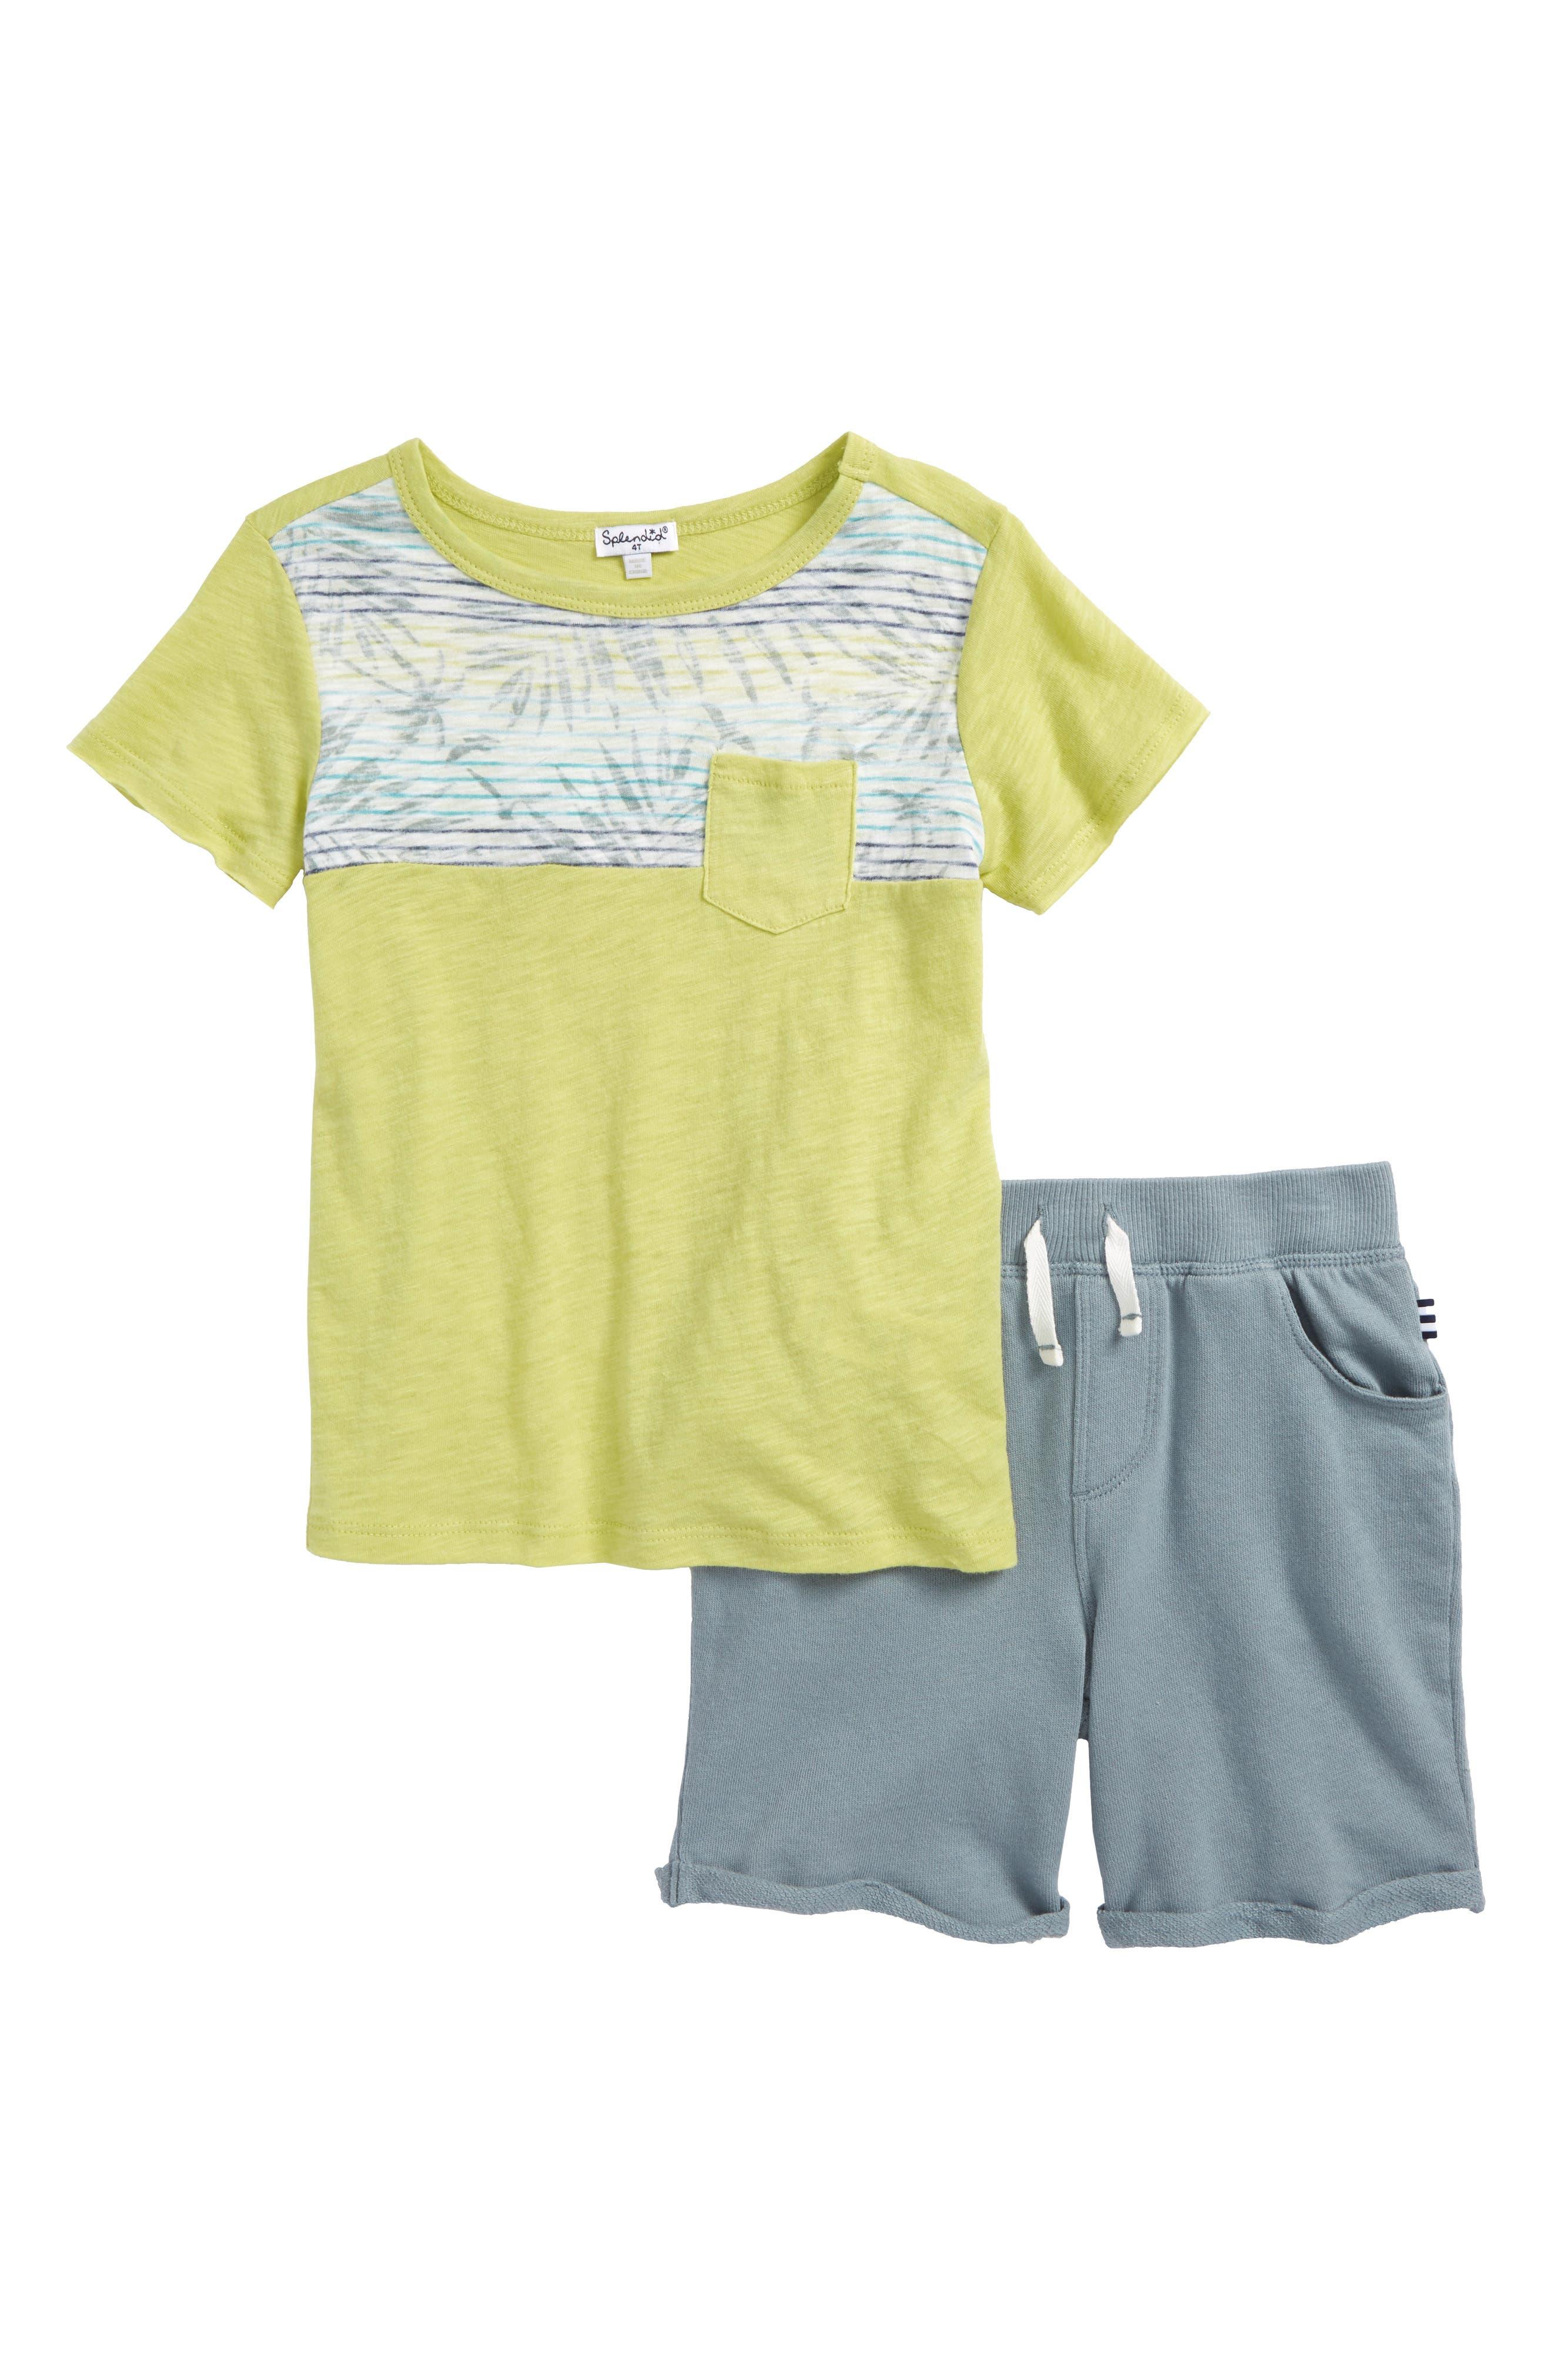 Main Image - Splendid Reverse Print T-Shirt & Shorts Set (Toddler Boys & Little Boys)